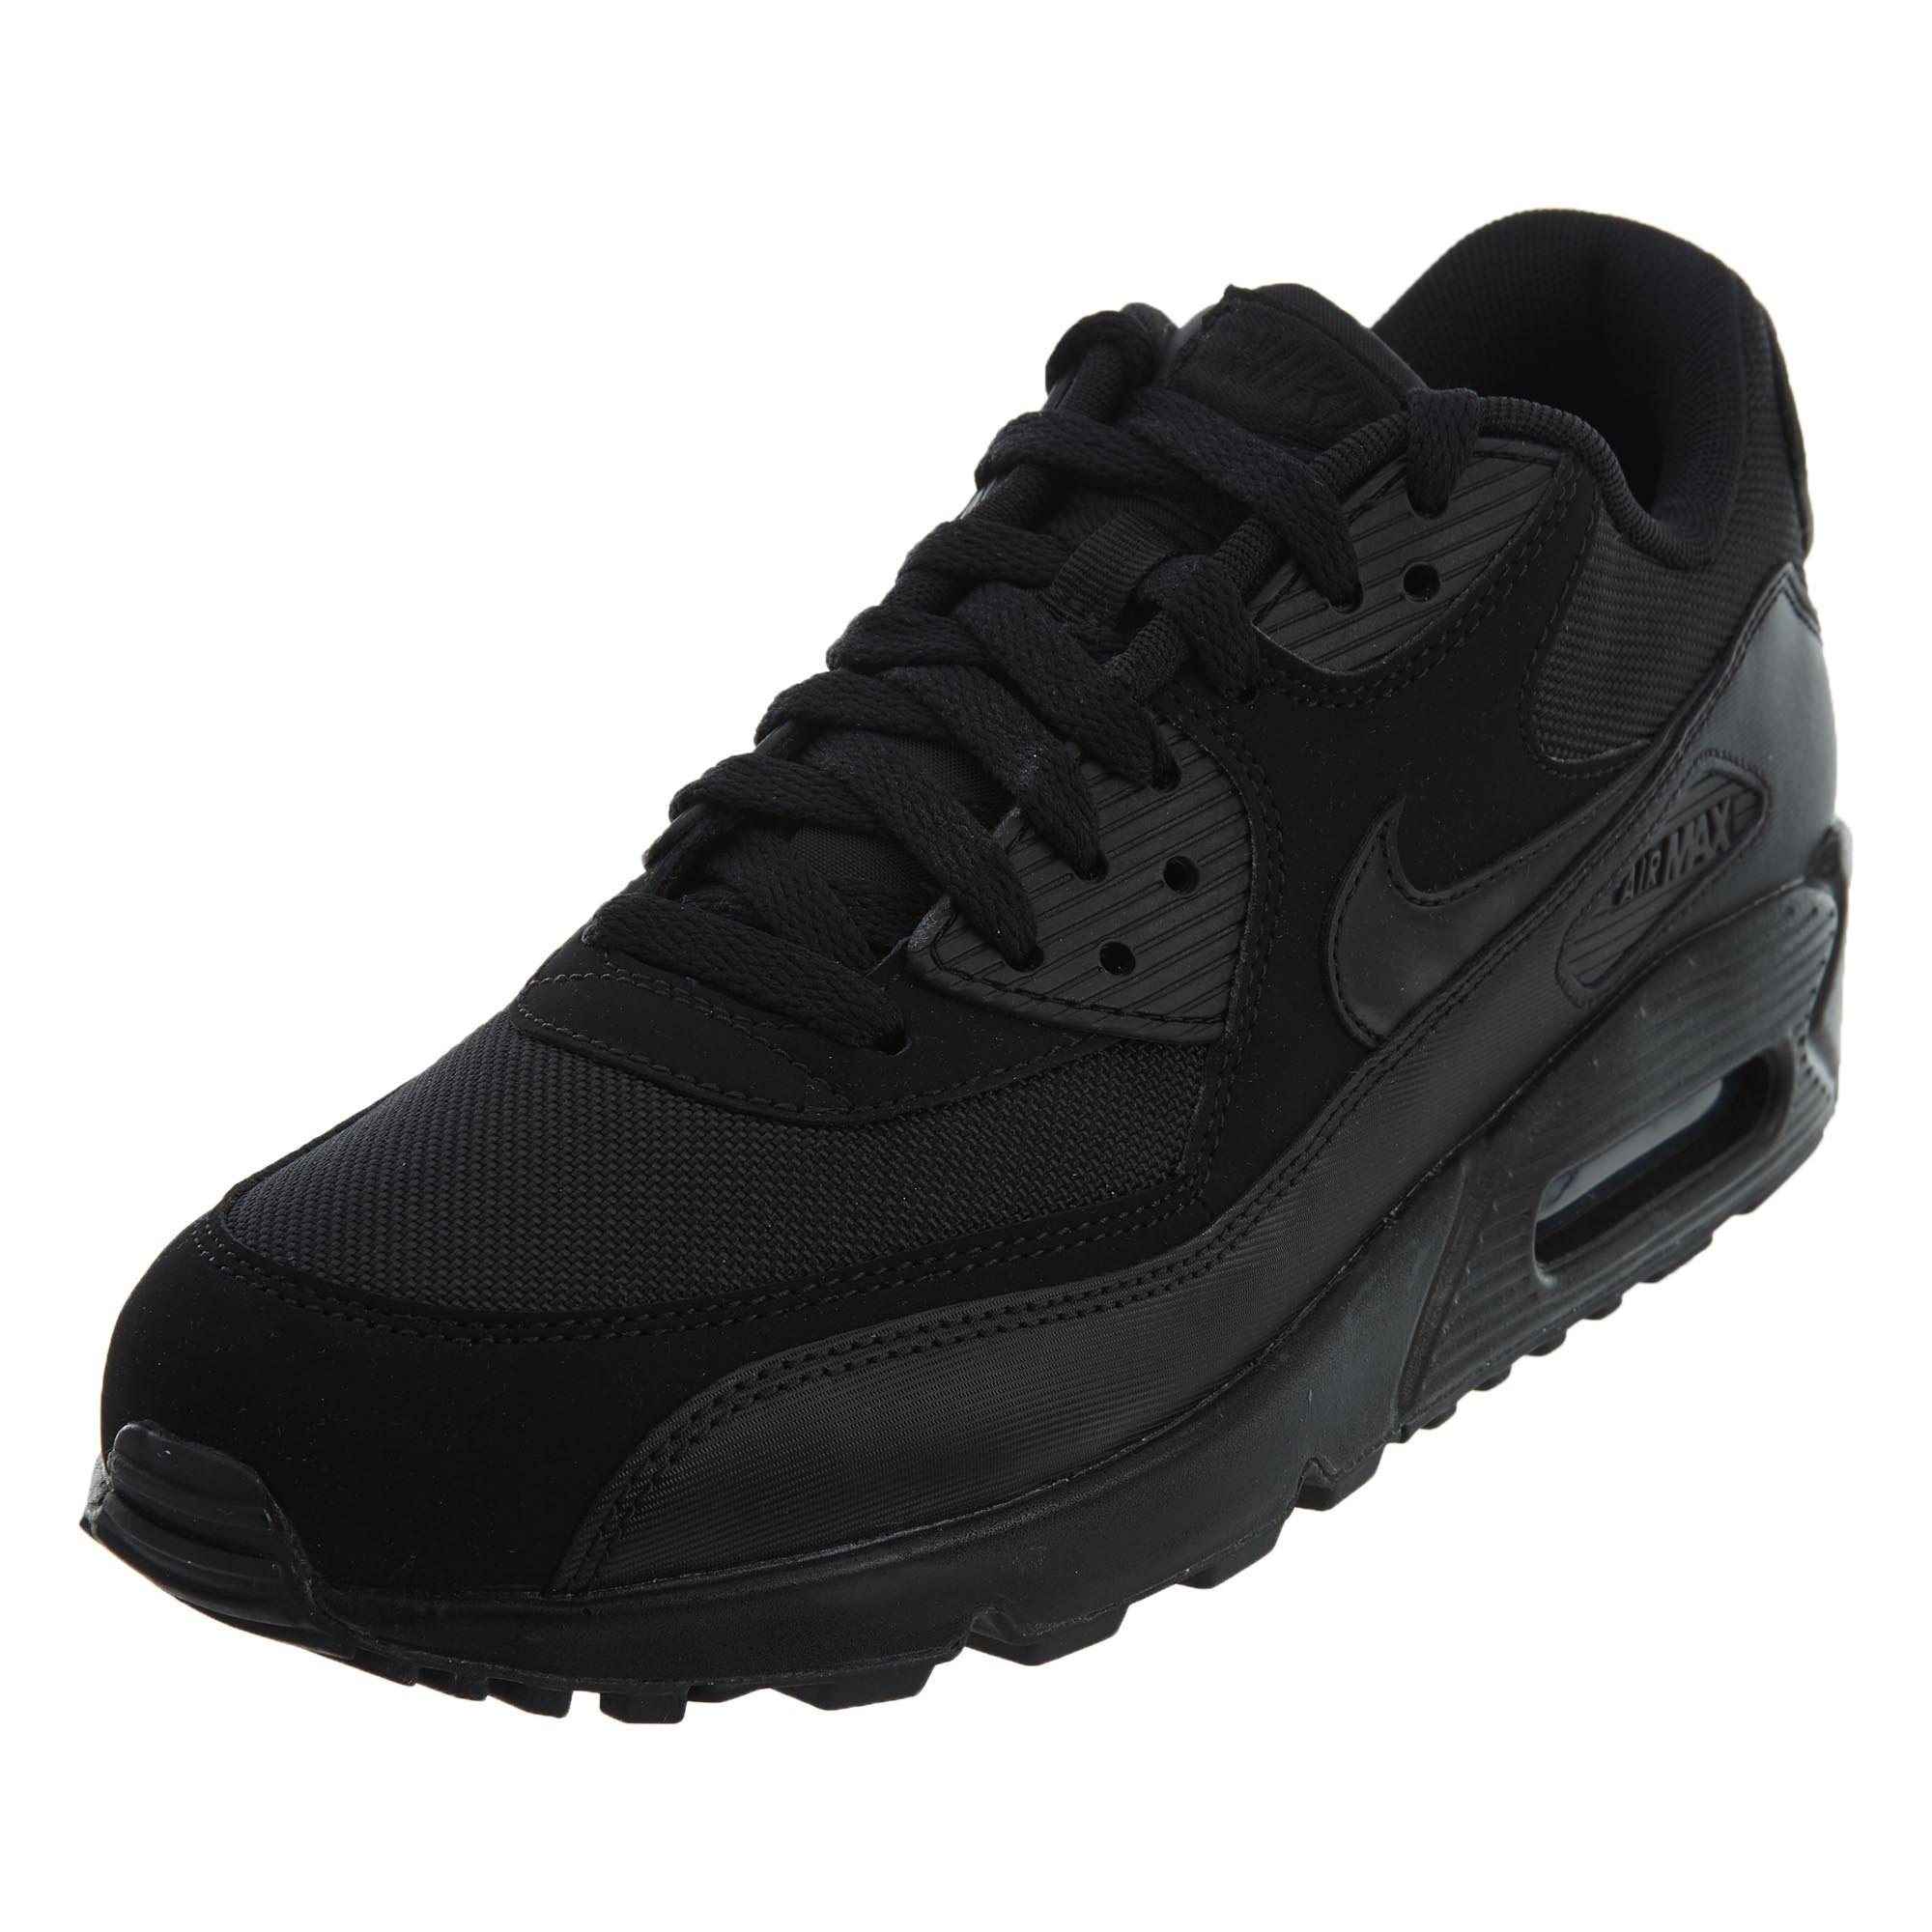 d677f10c9f4e0 Nike Men's Air Max 90 Essential Running Shoes, Black/Black, 7.5 M US